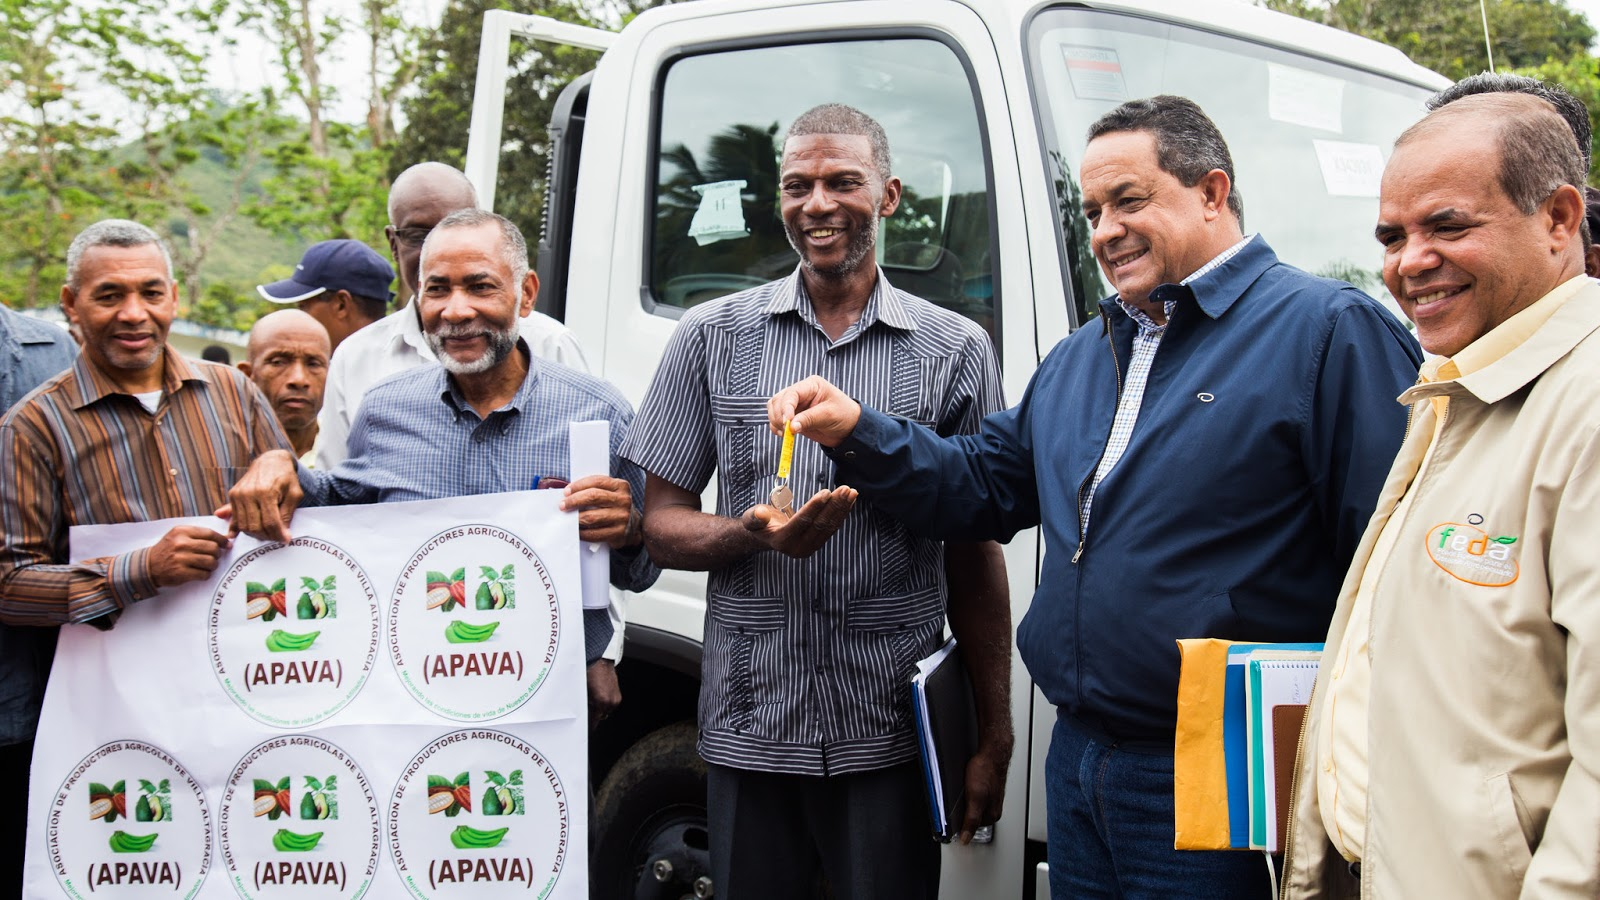 Cacaocultores Villa Altagracia reciben camión; iniciarán centro de fermentación, vivero y secaderos